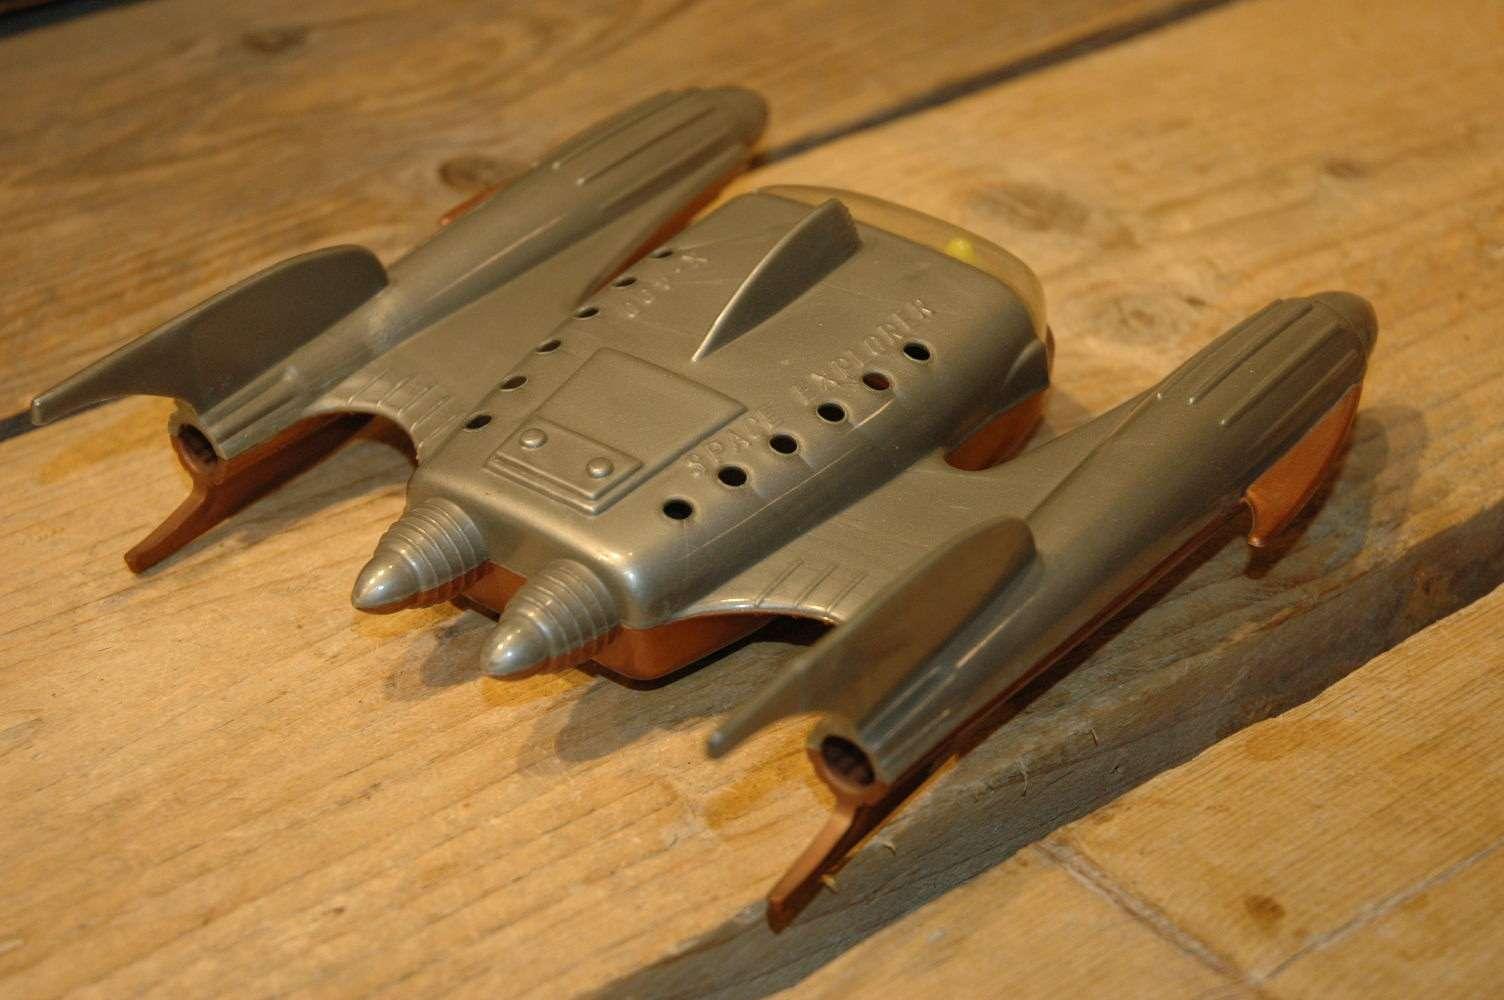 Kleeware ( UK ) - Space Explorer X-400